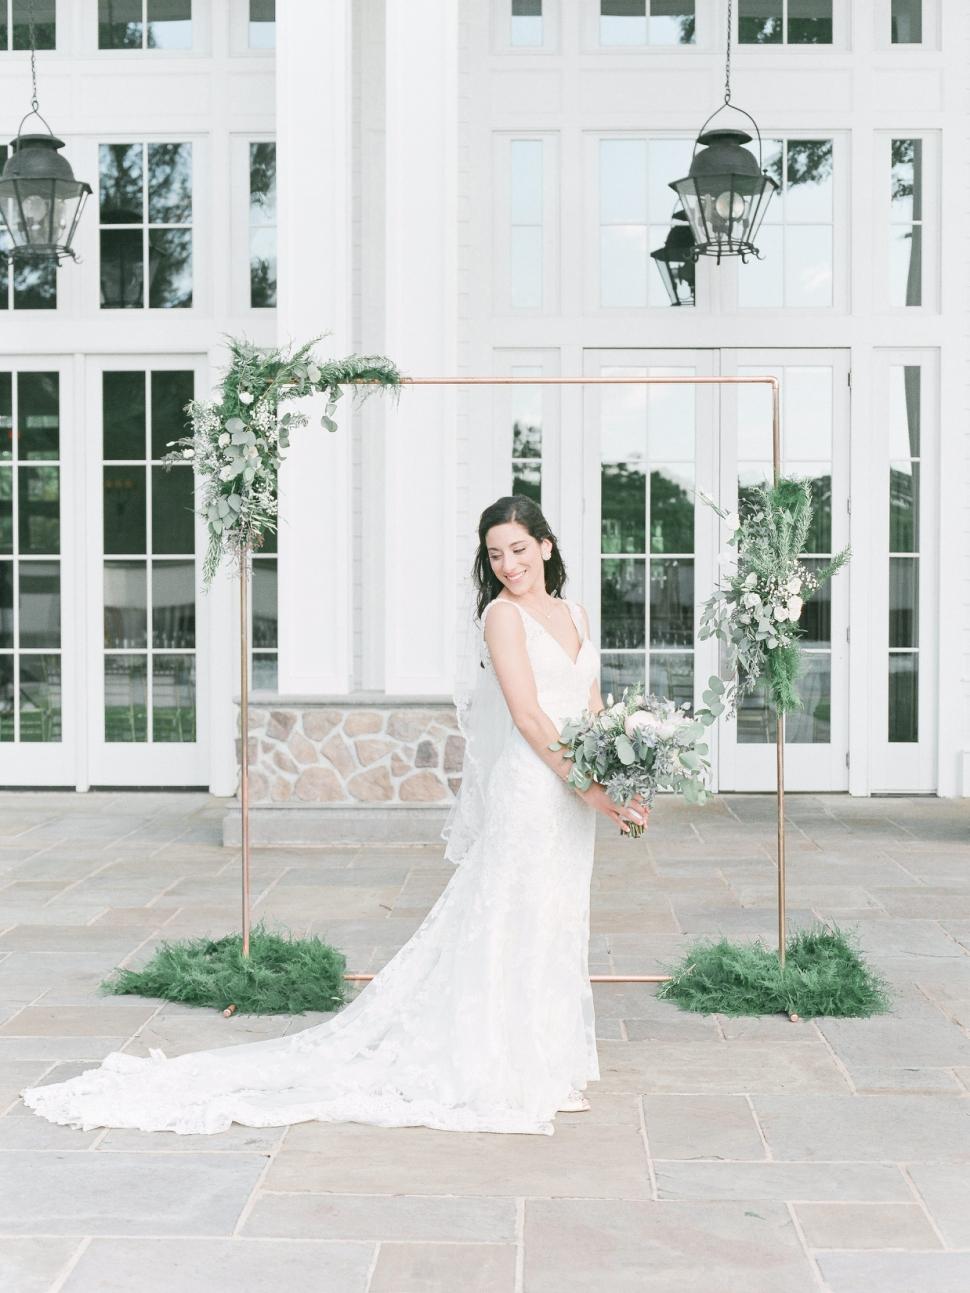 Ryland-Inn-Wedding-Photographer-Cassi-Claire_Ryland-Inn-Wedding_25.jpg